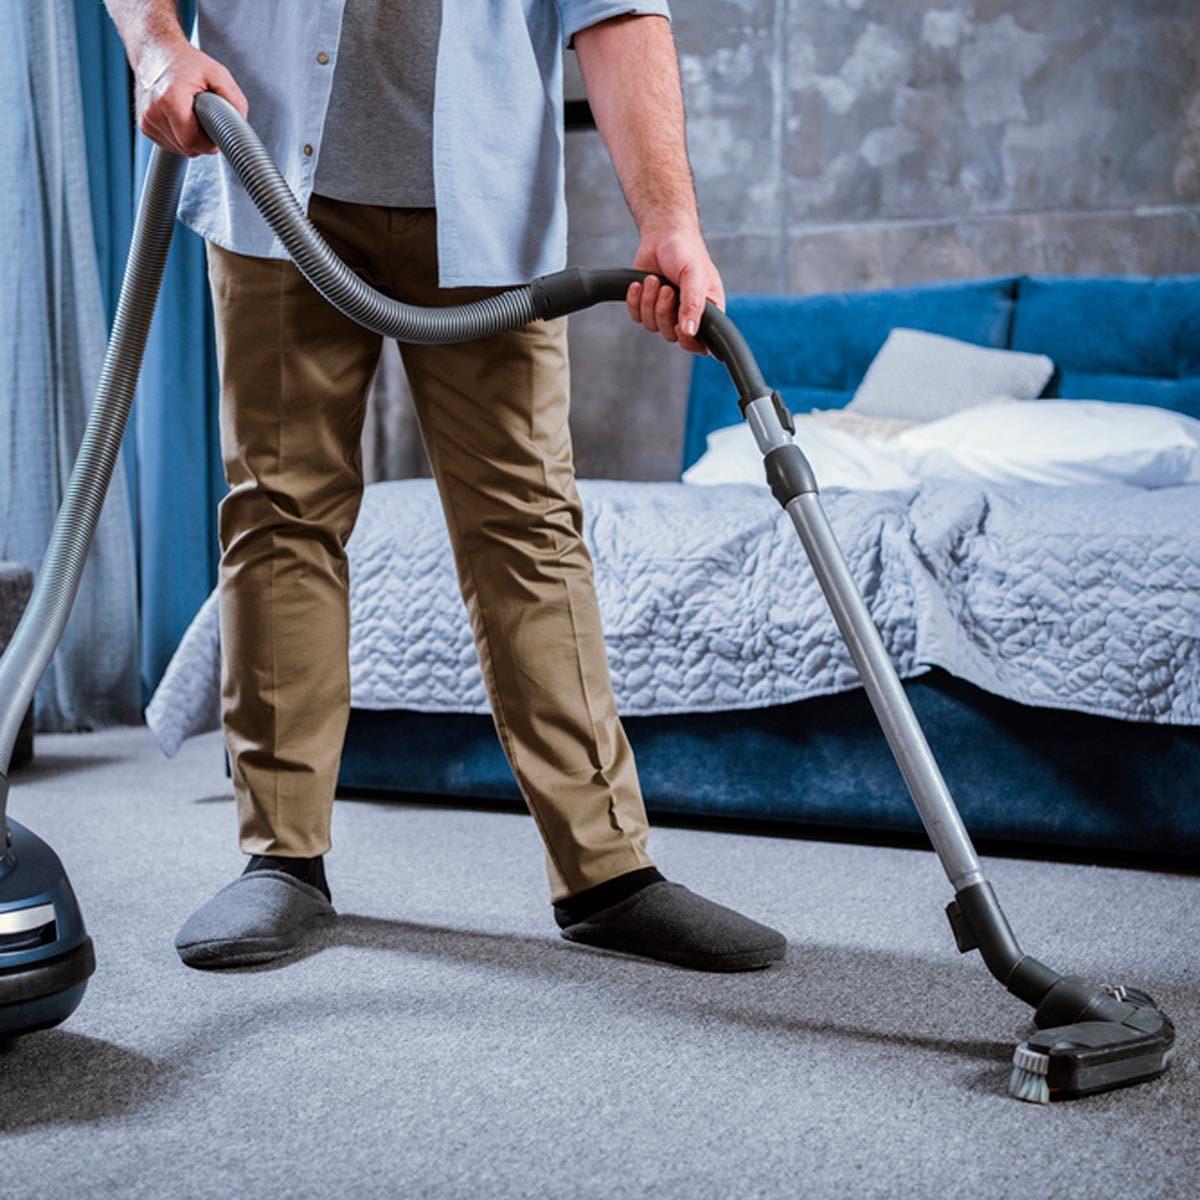 Vacuuming bedroom